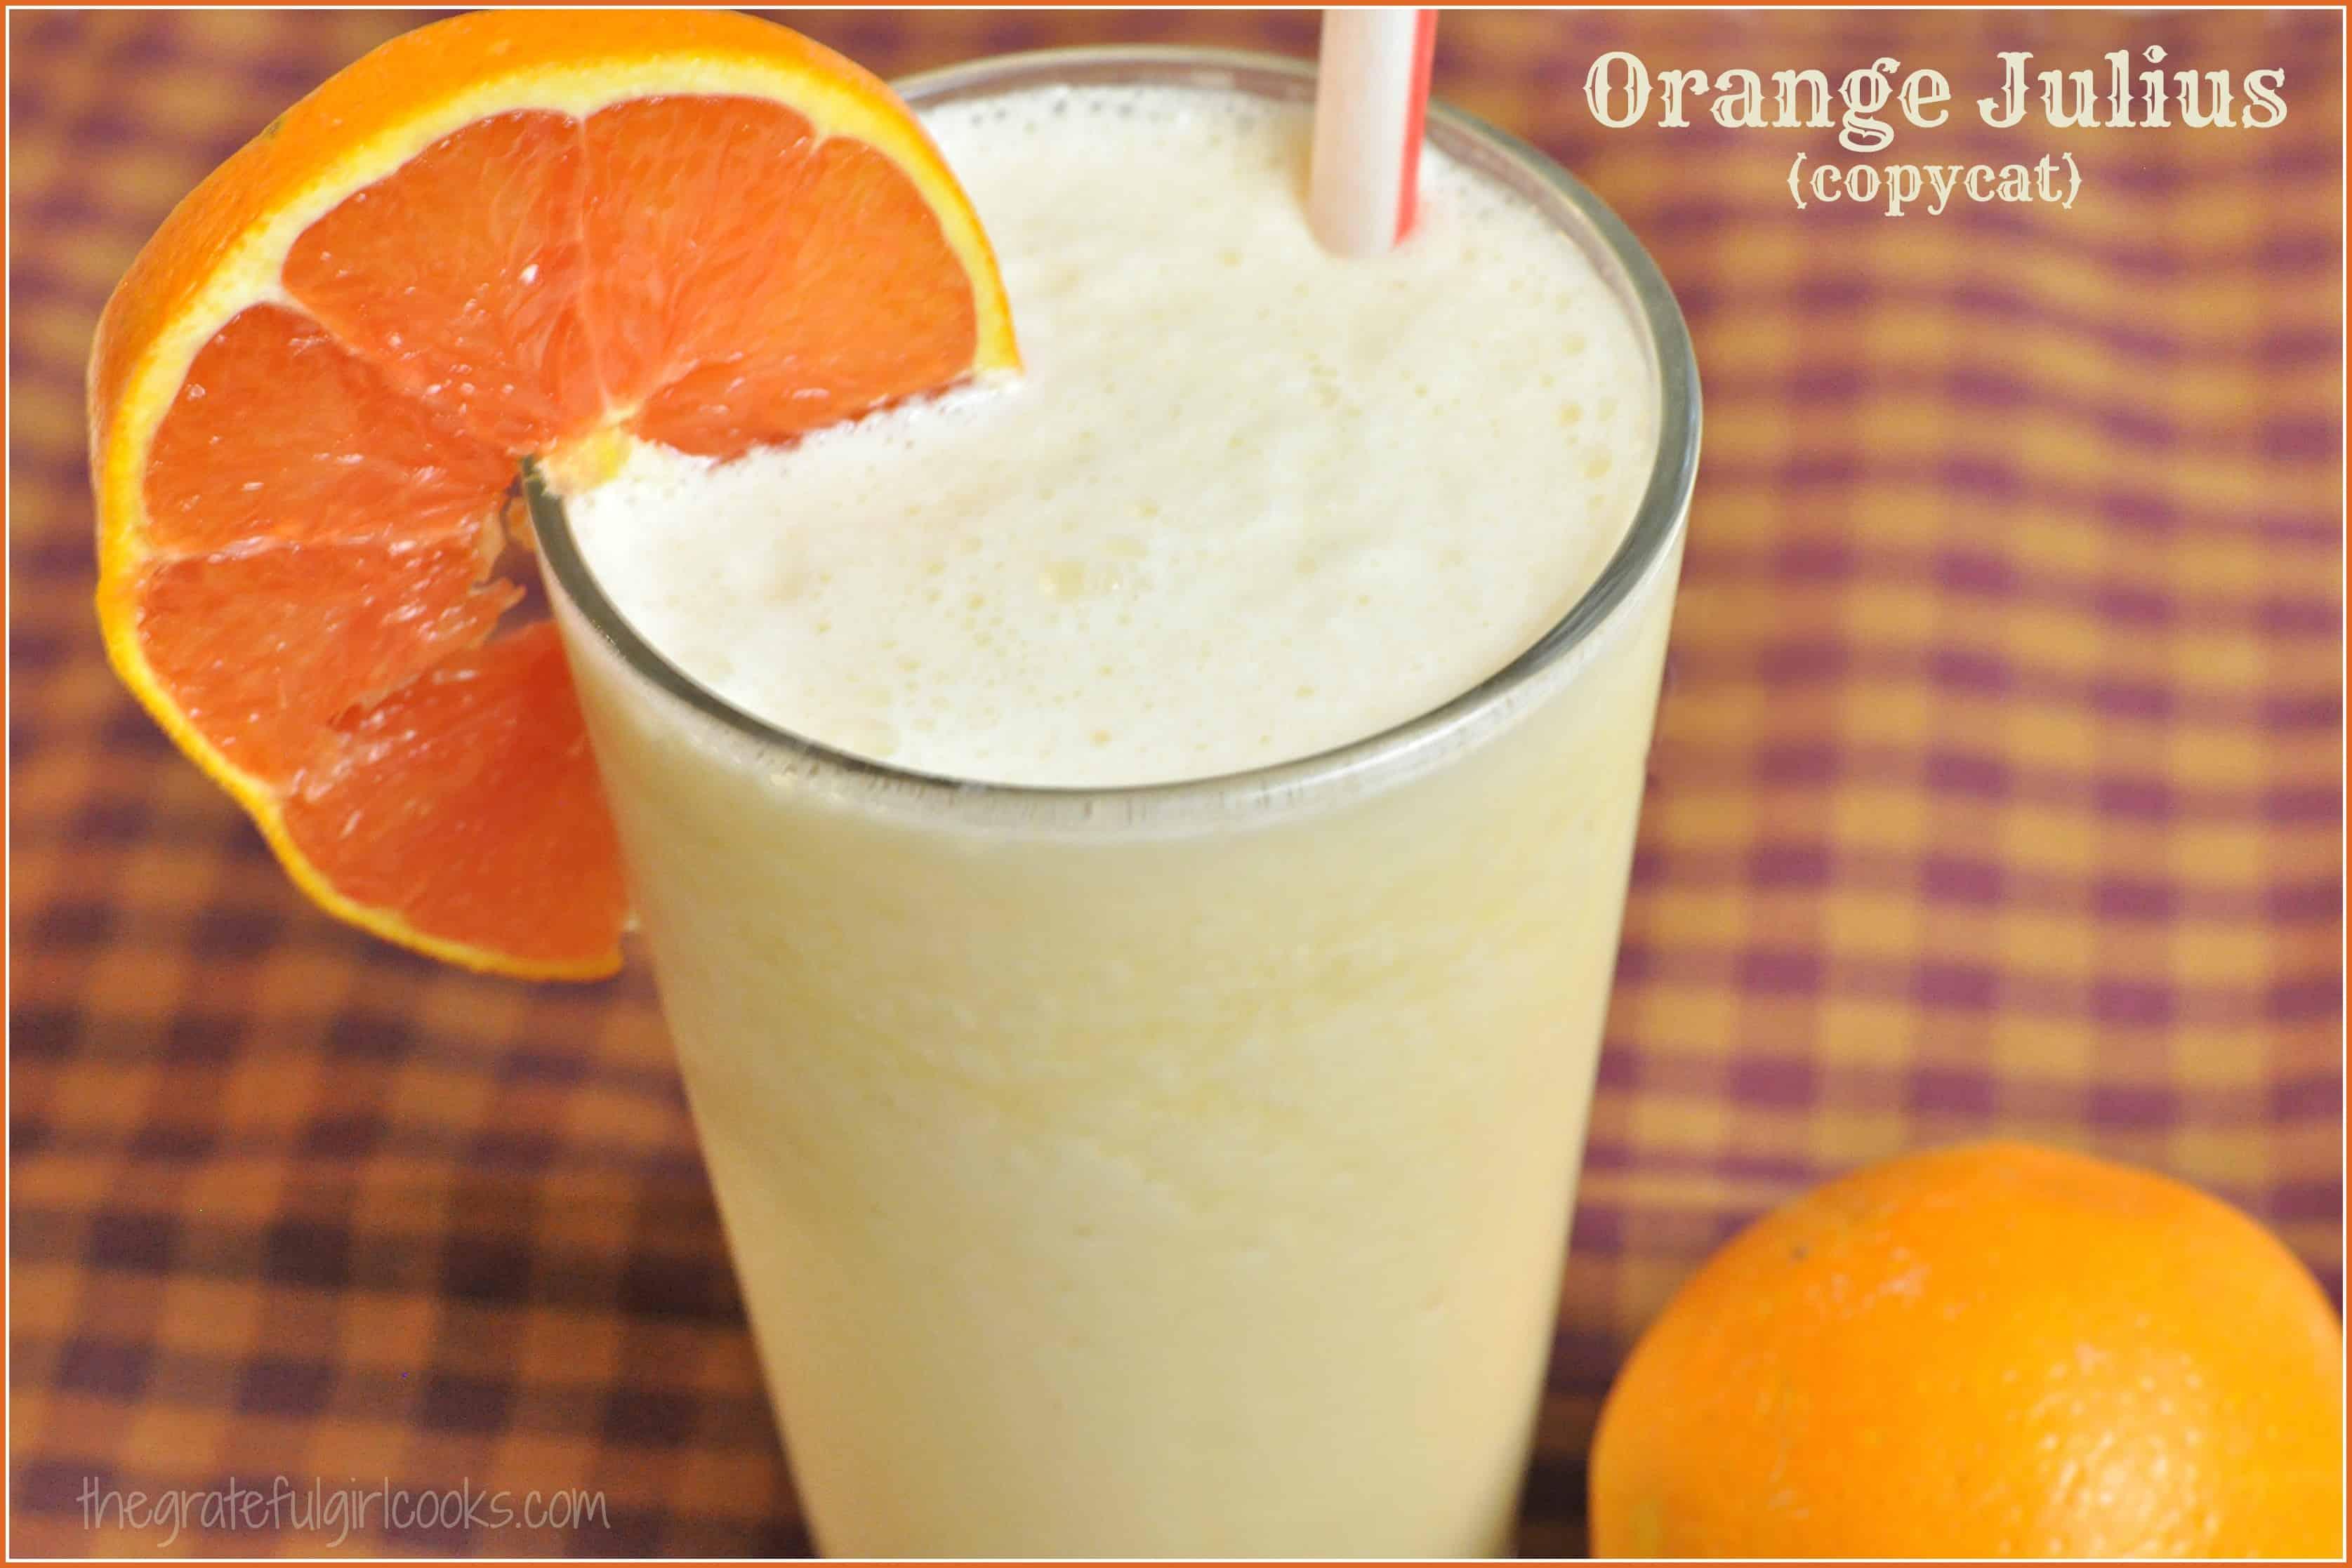 You might also enjoy this Orange Julius (copycat) / The Grateful Girl Cooks!